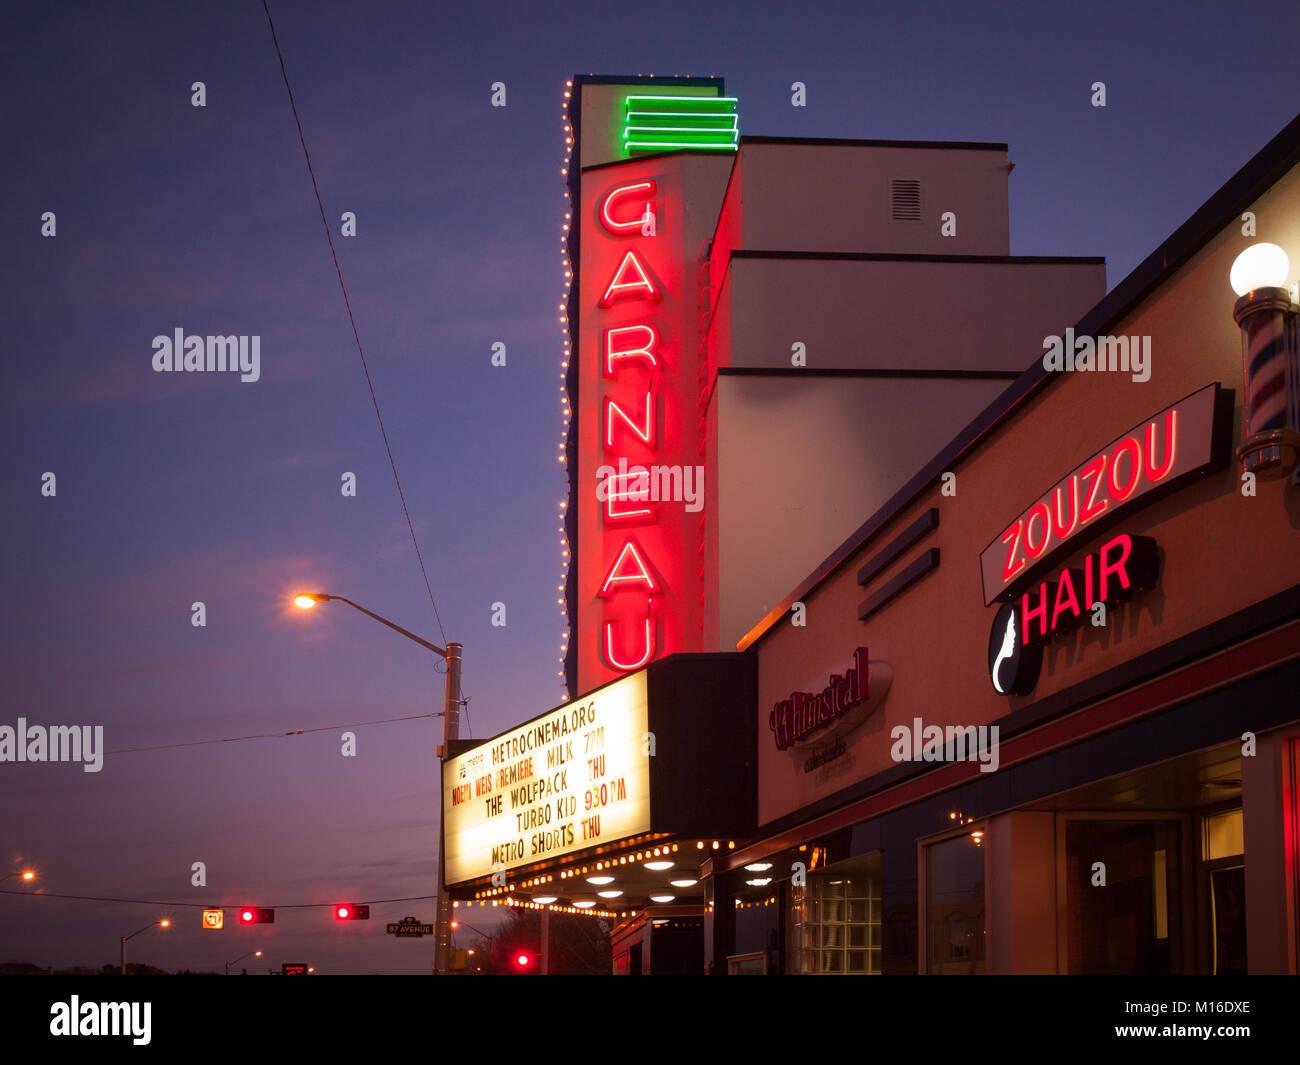 A night view of the historic Garneau Theatre in the Garneau / University of Alberta area of Edmonton, Alberta, Canada. - Stock Image